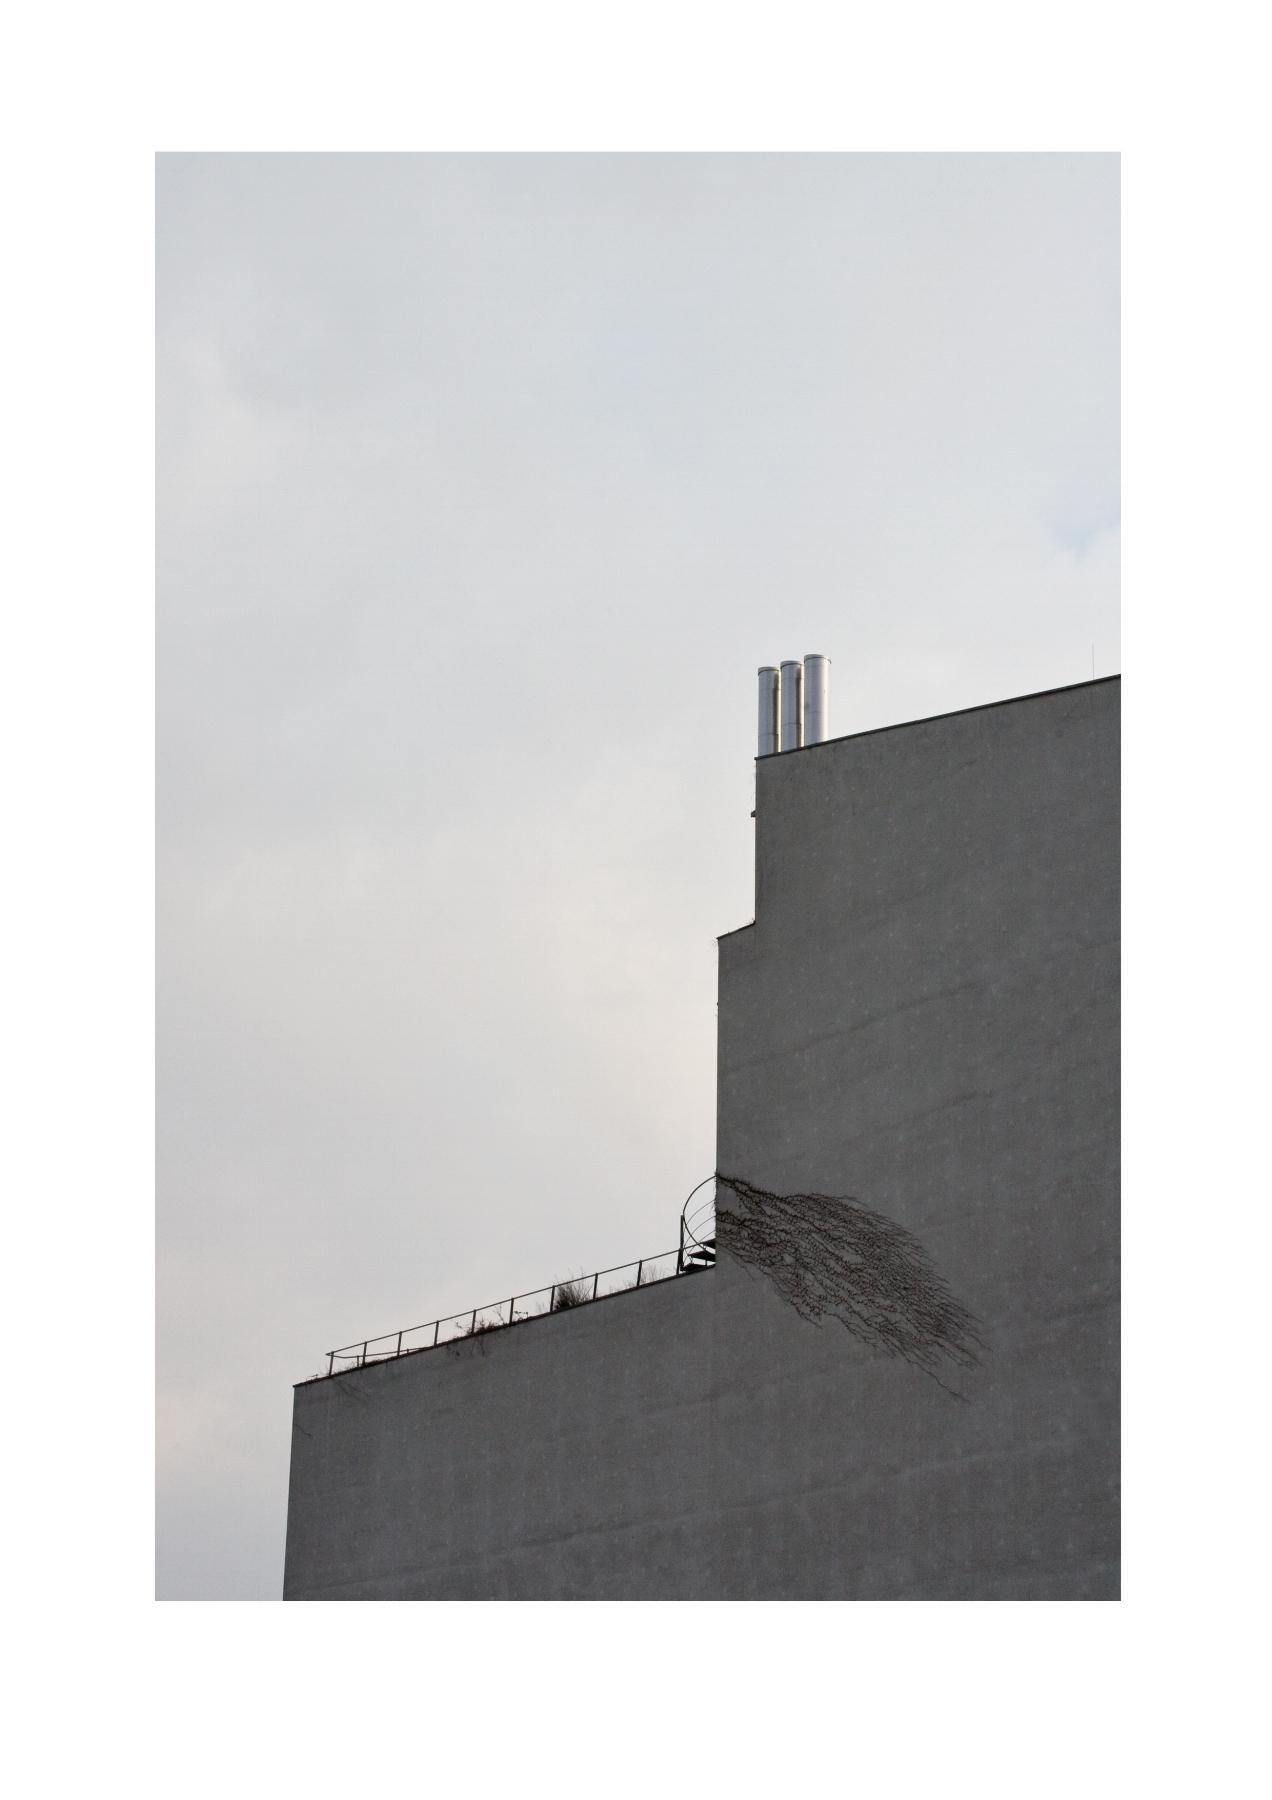 Berlin_creeper.jpg